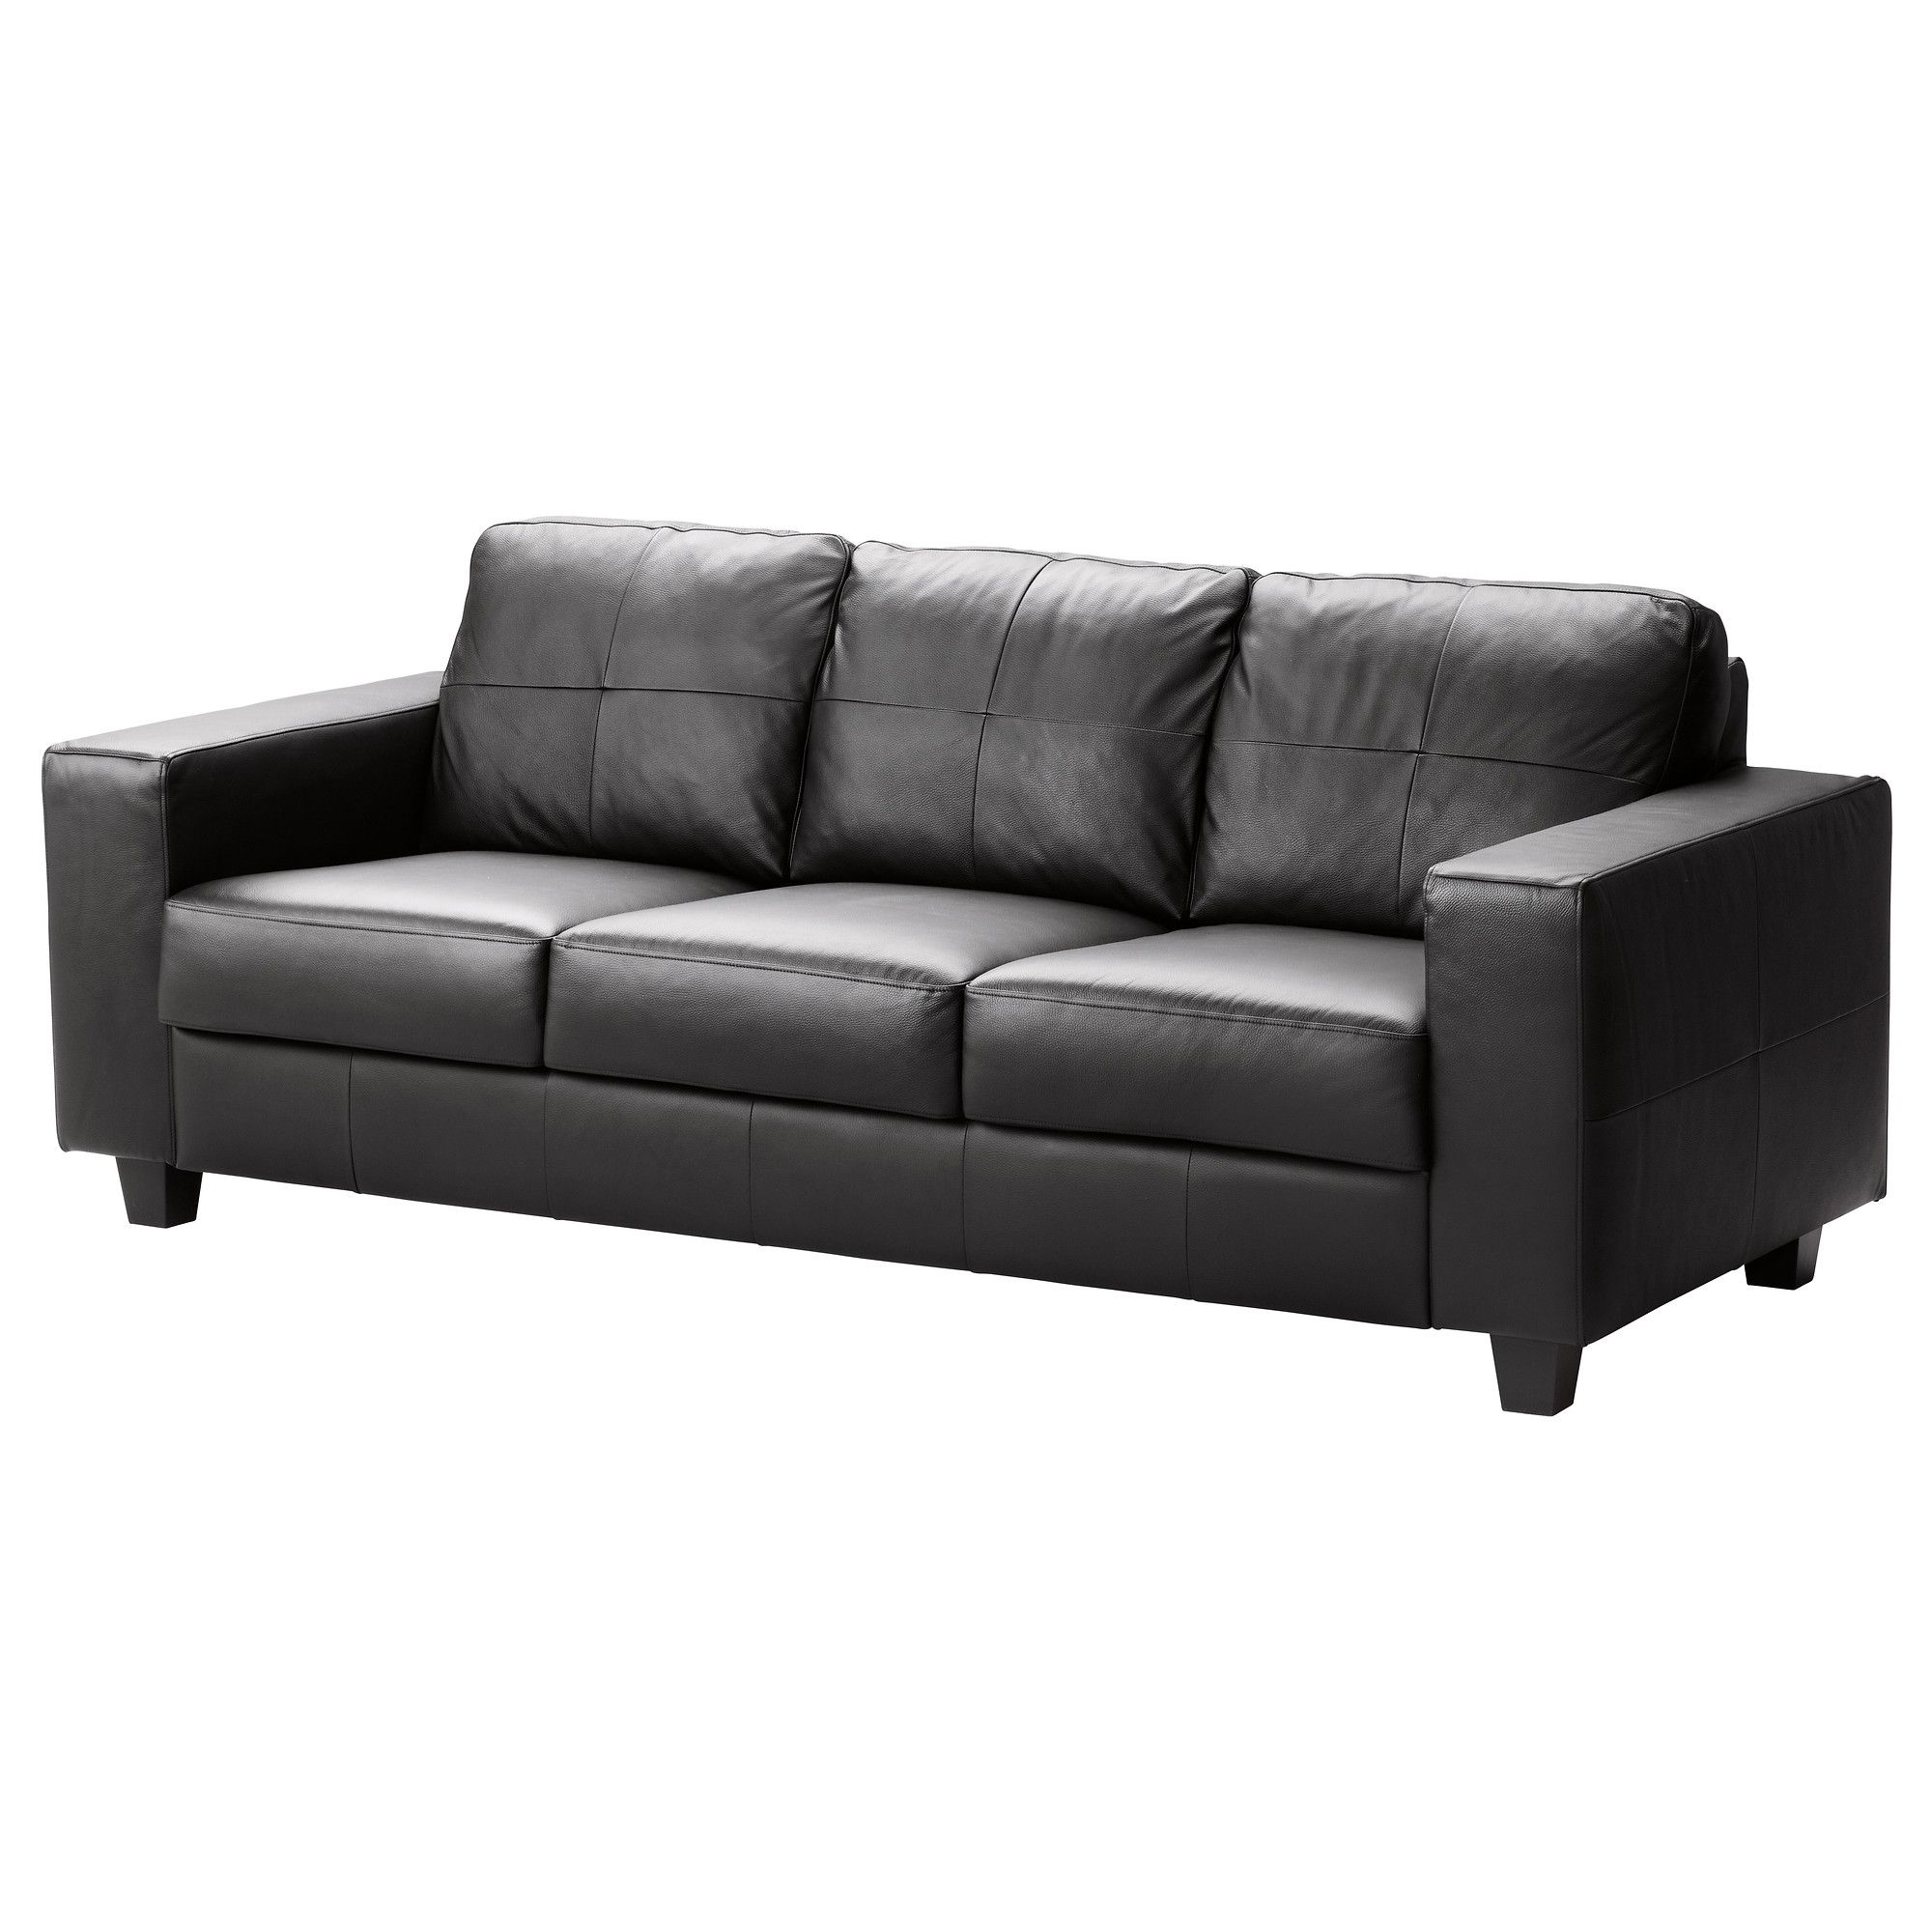 Ikea Us Furniture And Home Furnishings Ikea Leather Sofa Black Leather Sofa Bed Leather Sofa Bed